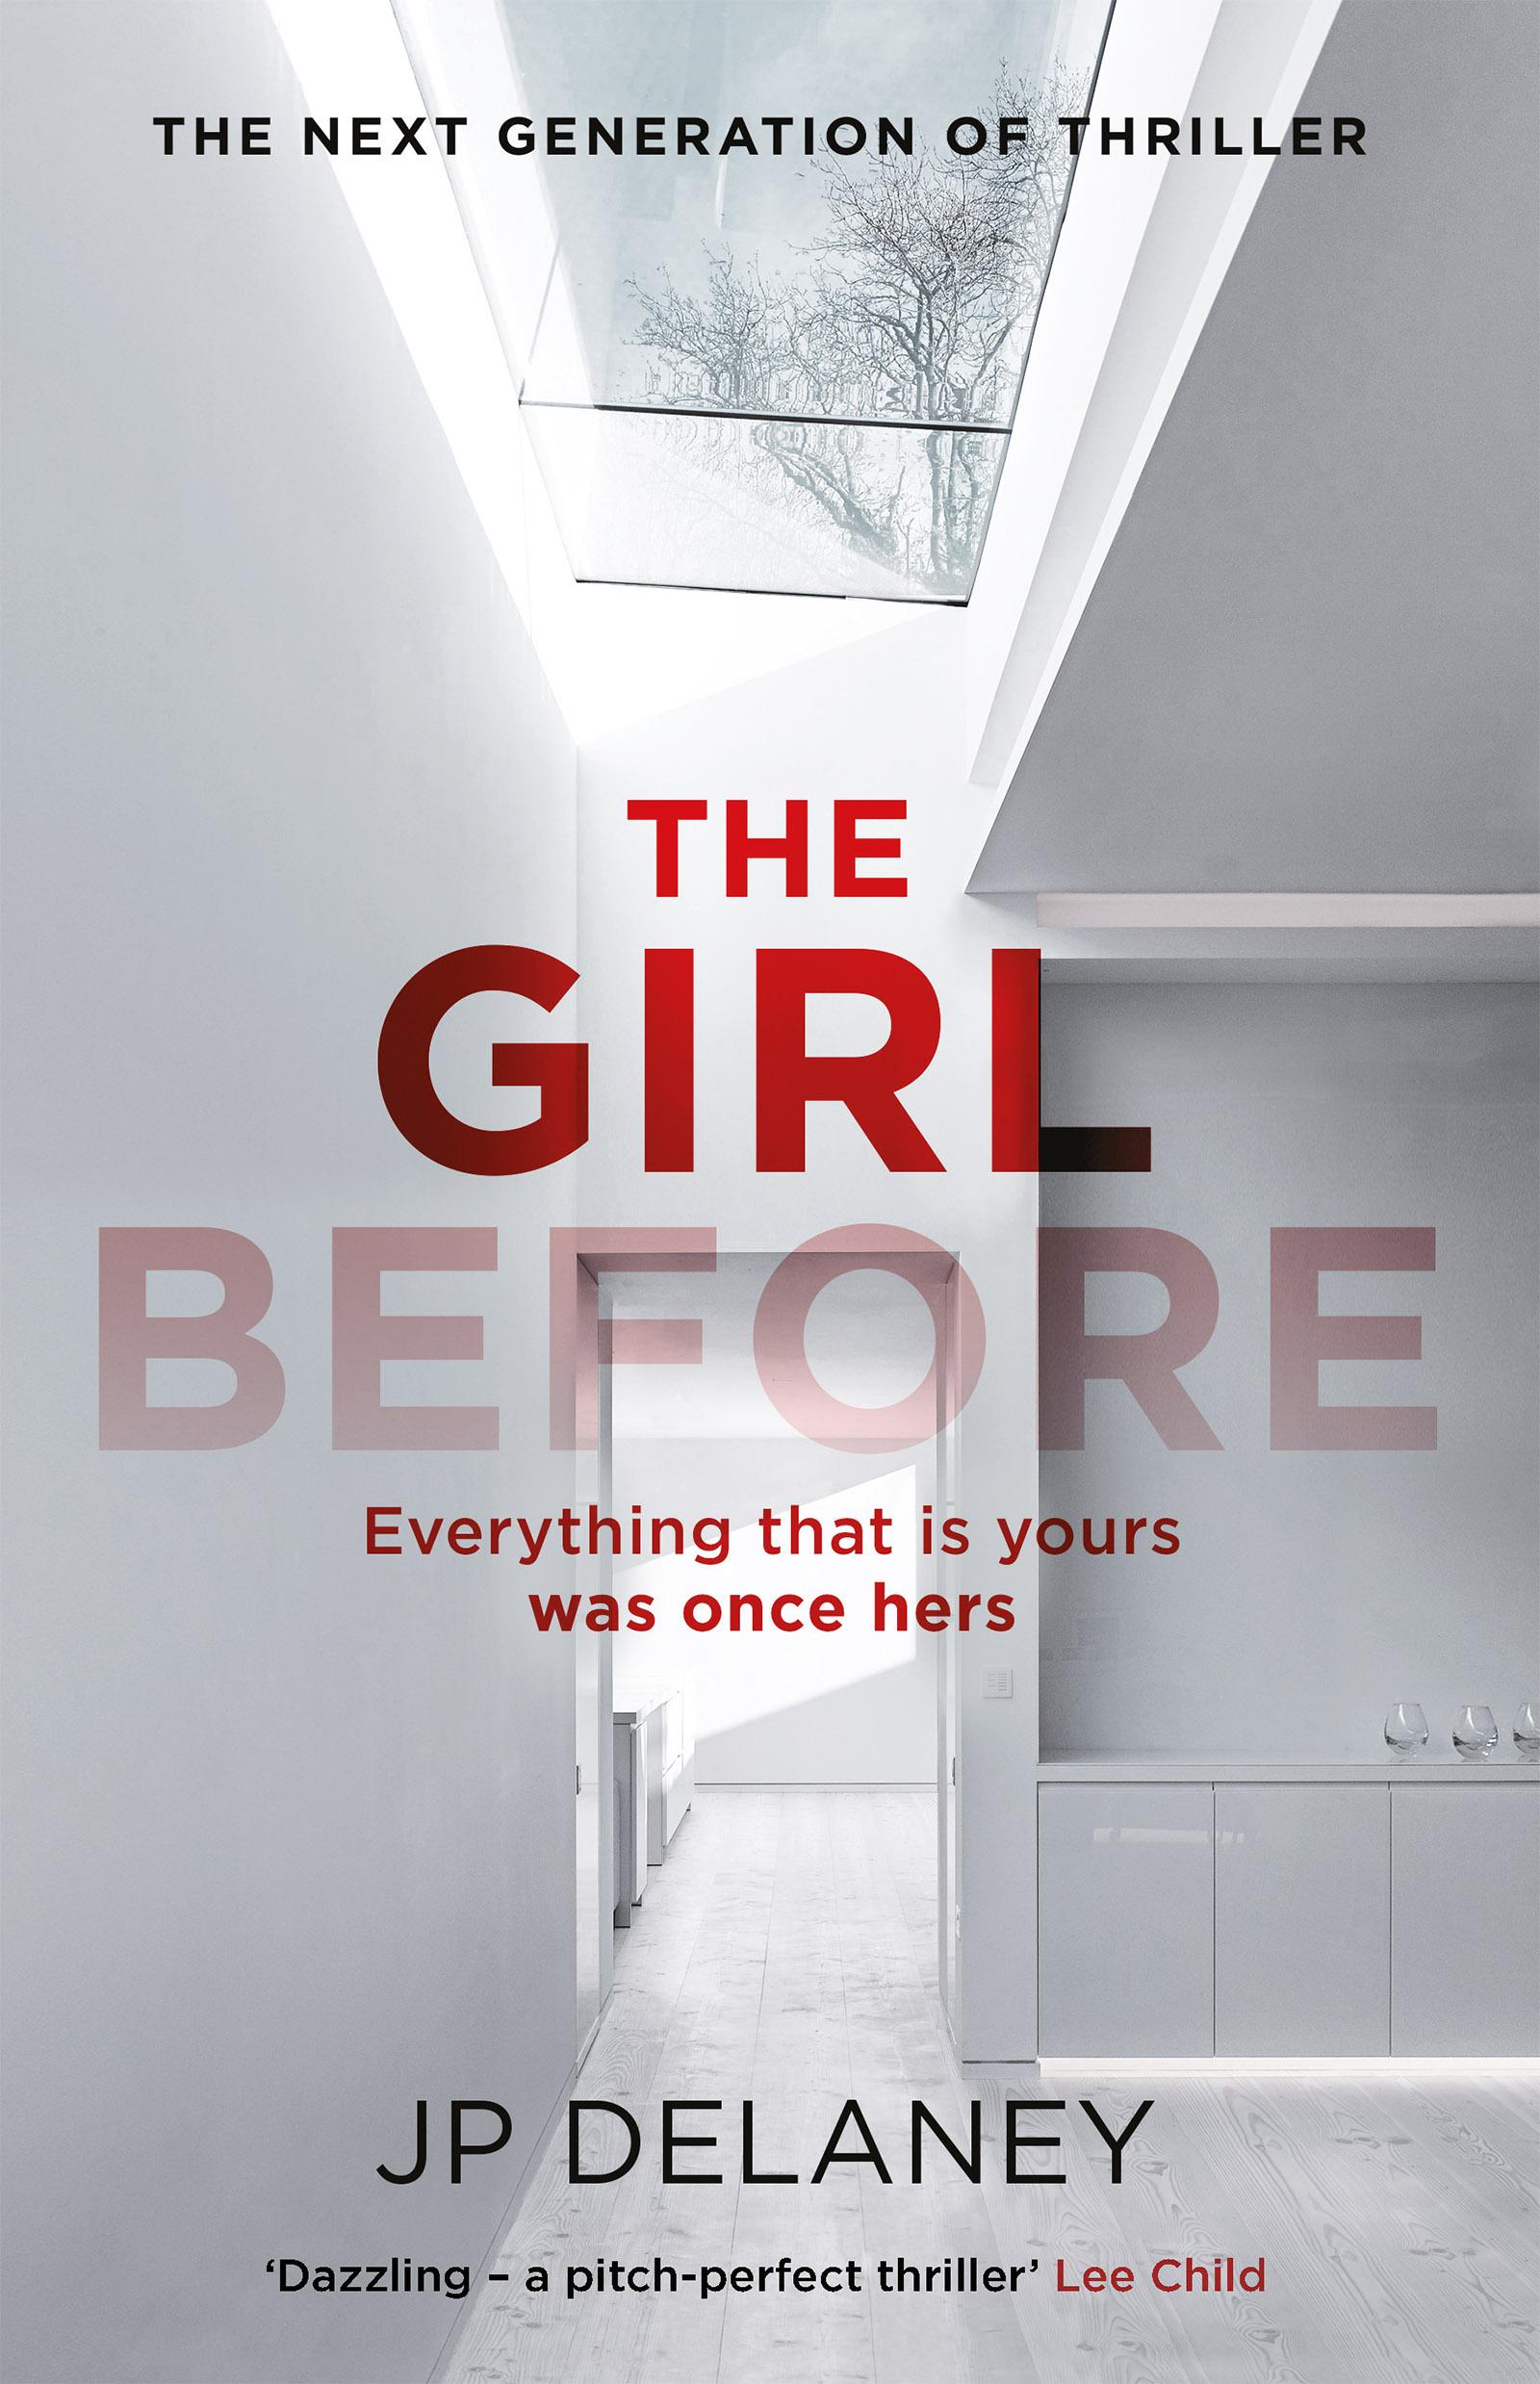 ABOY0022.05-The Girl Before.jpg